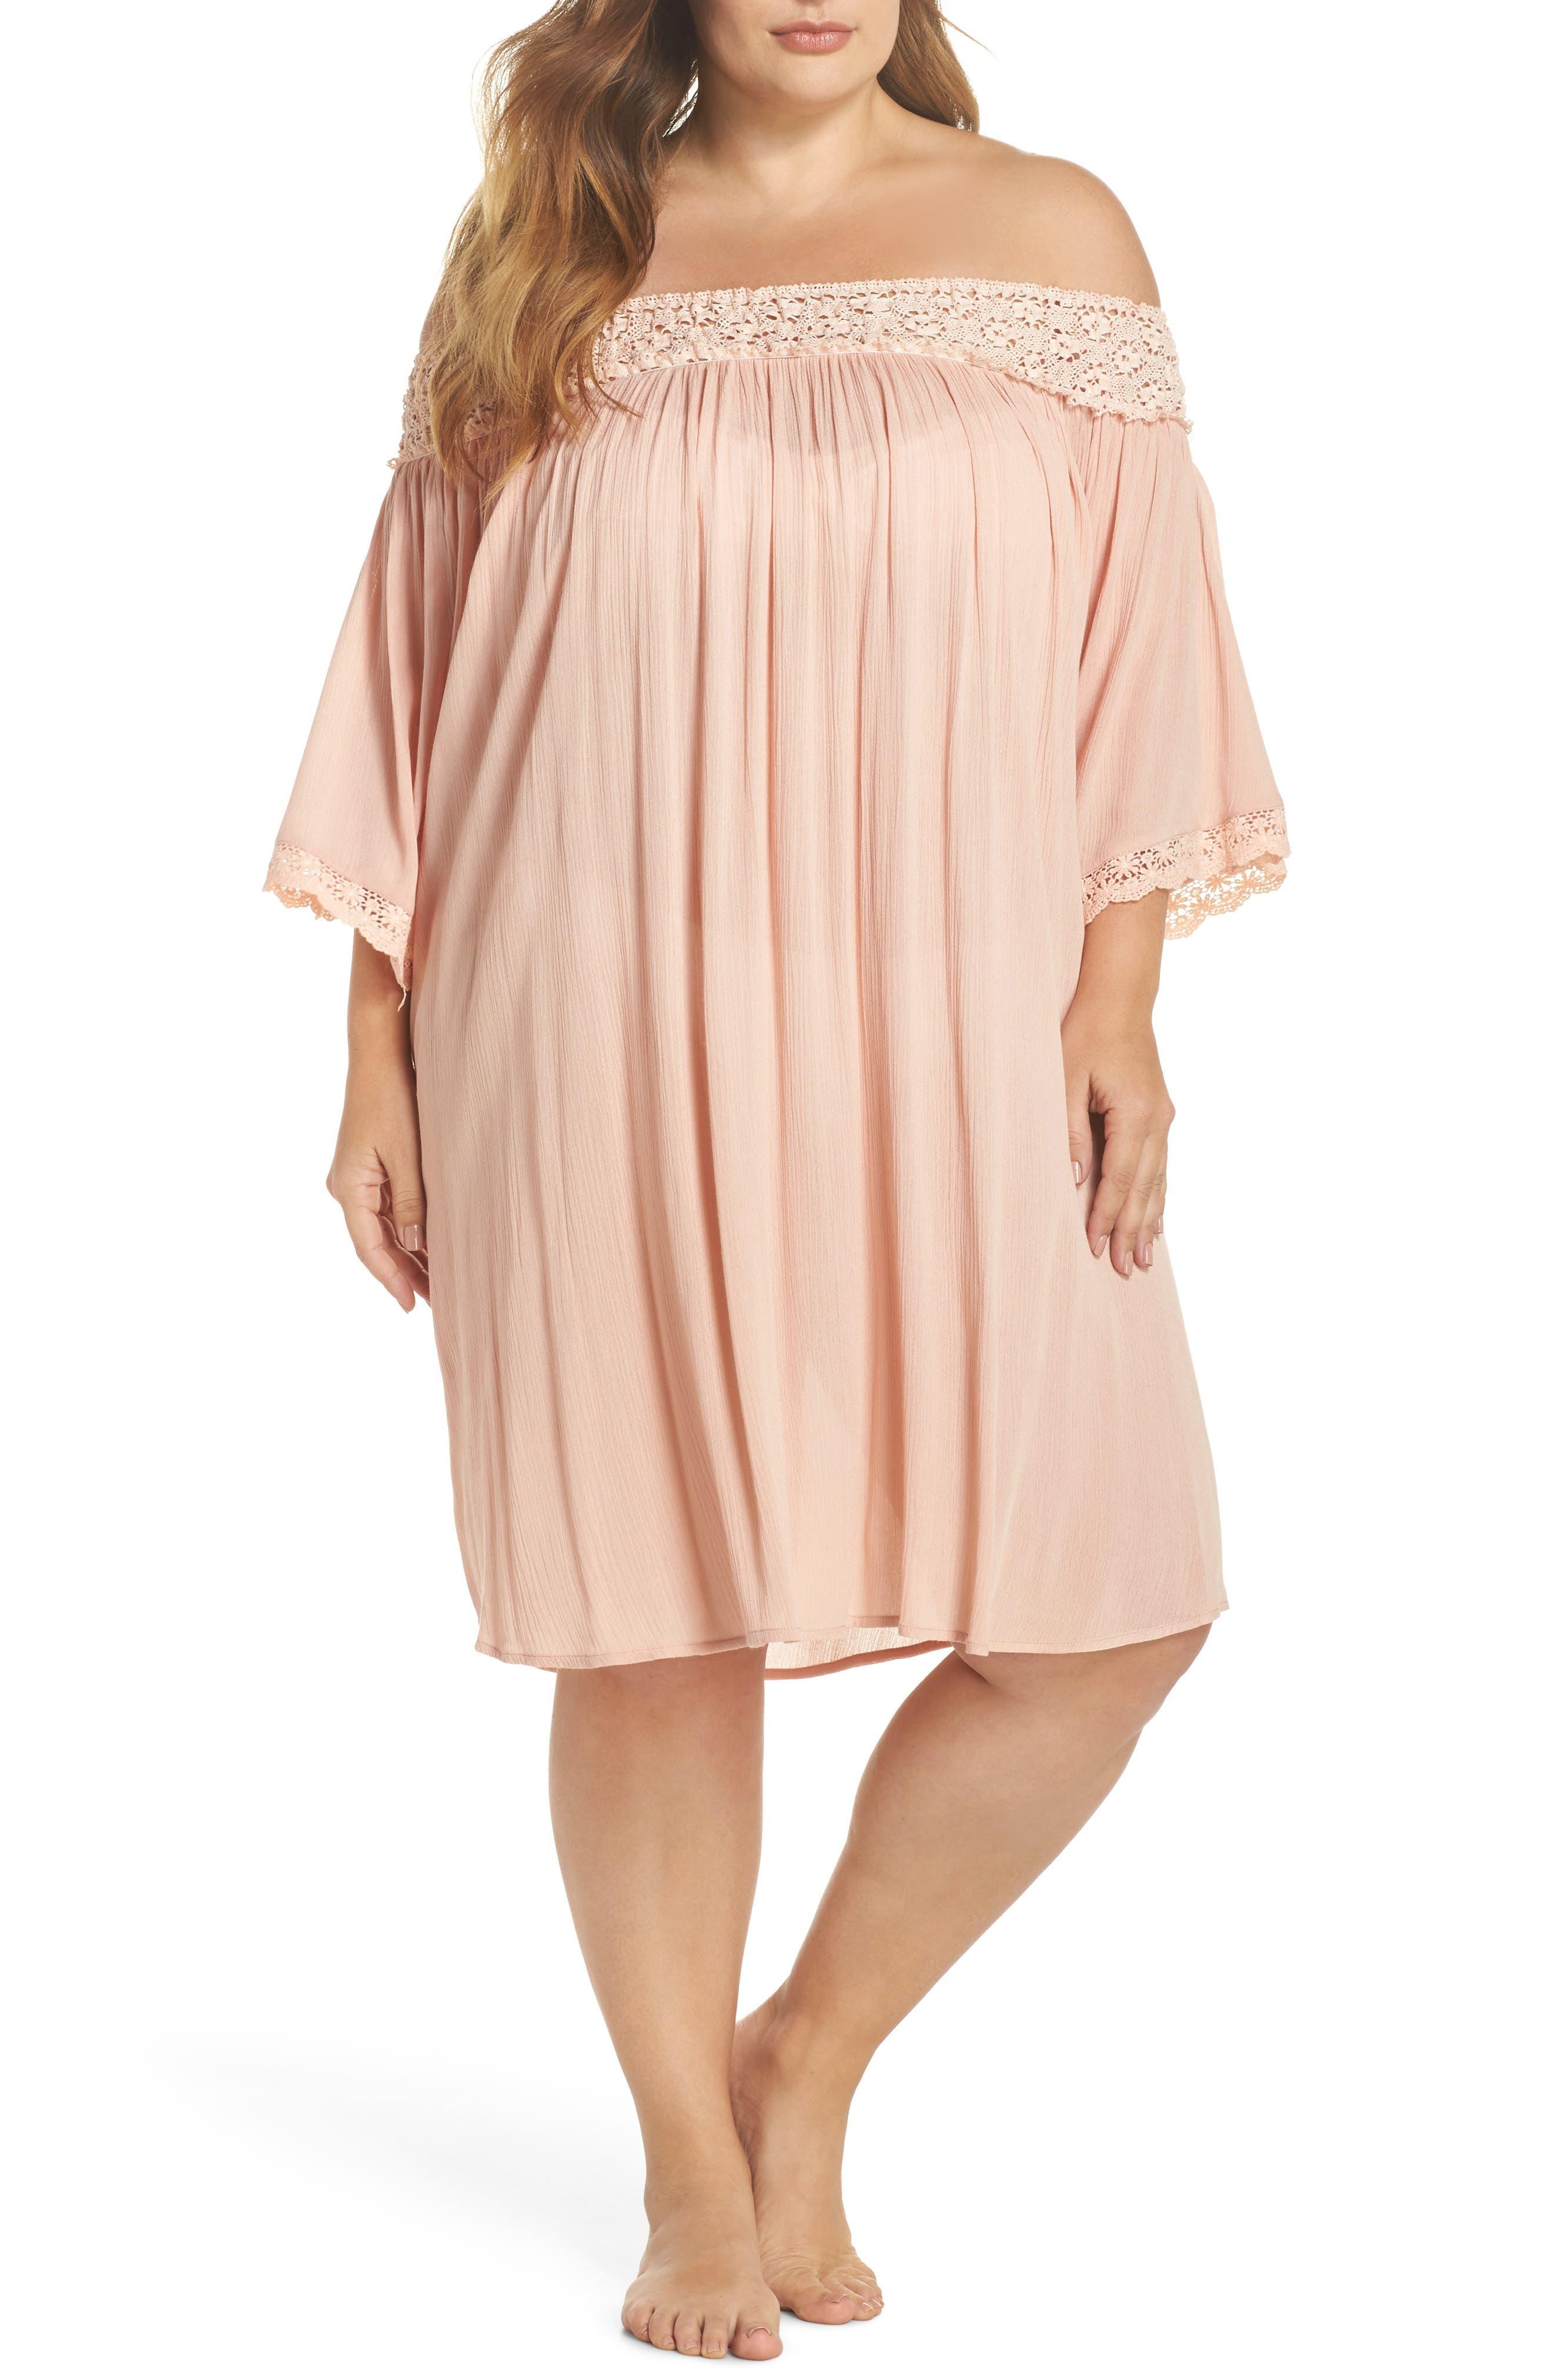 Rimini Crochet Cover-Up Dress,                         Main,                         color, Pink